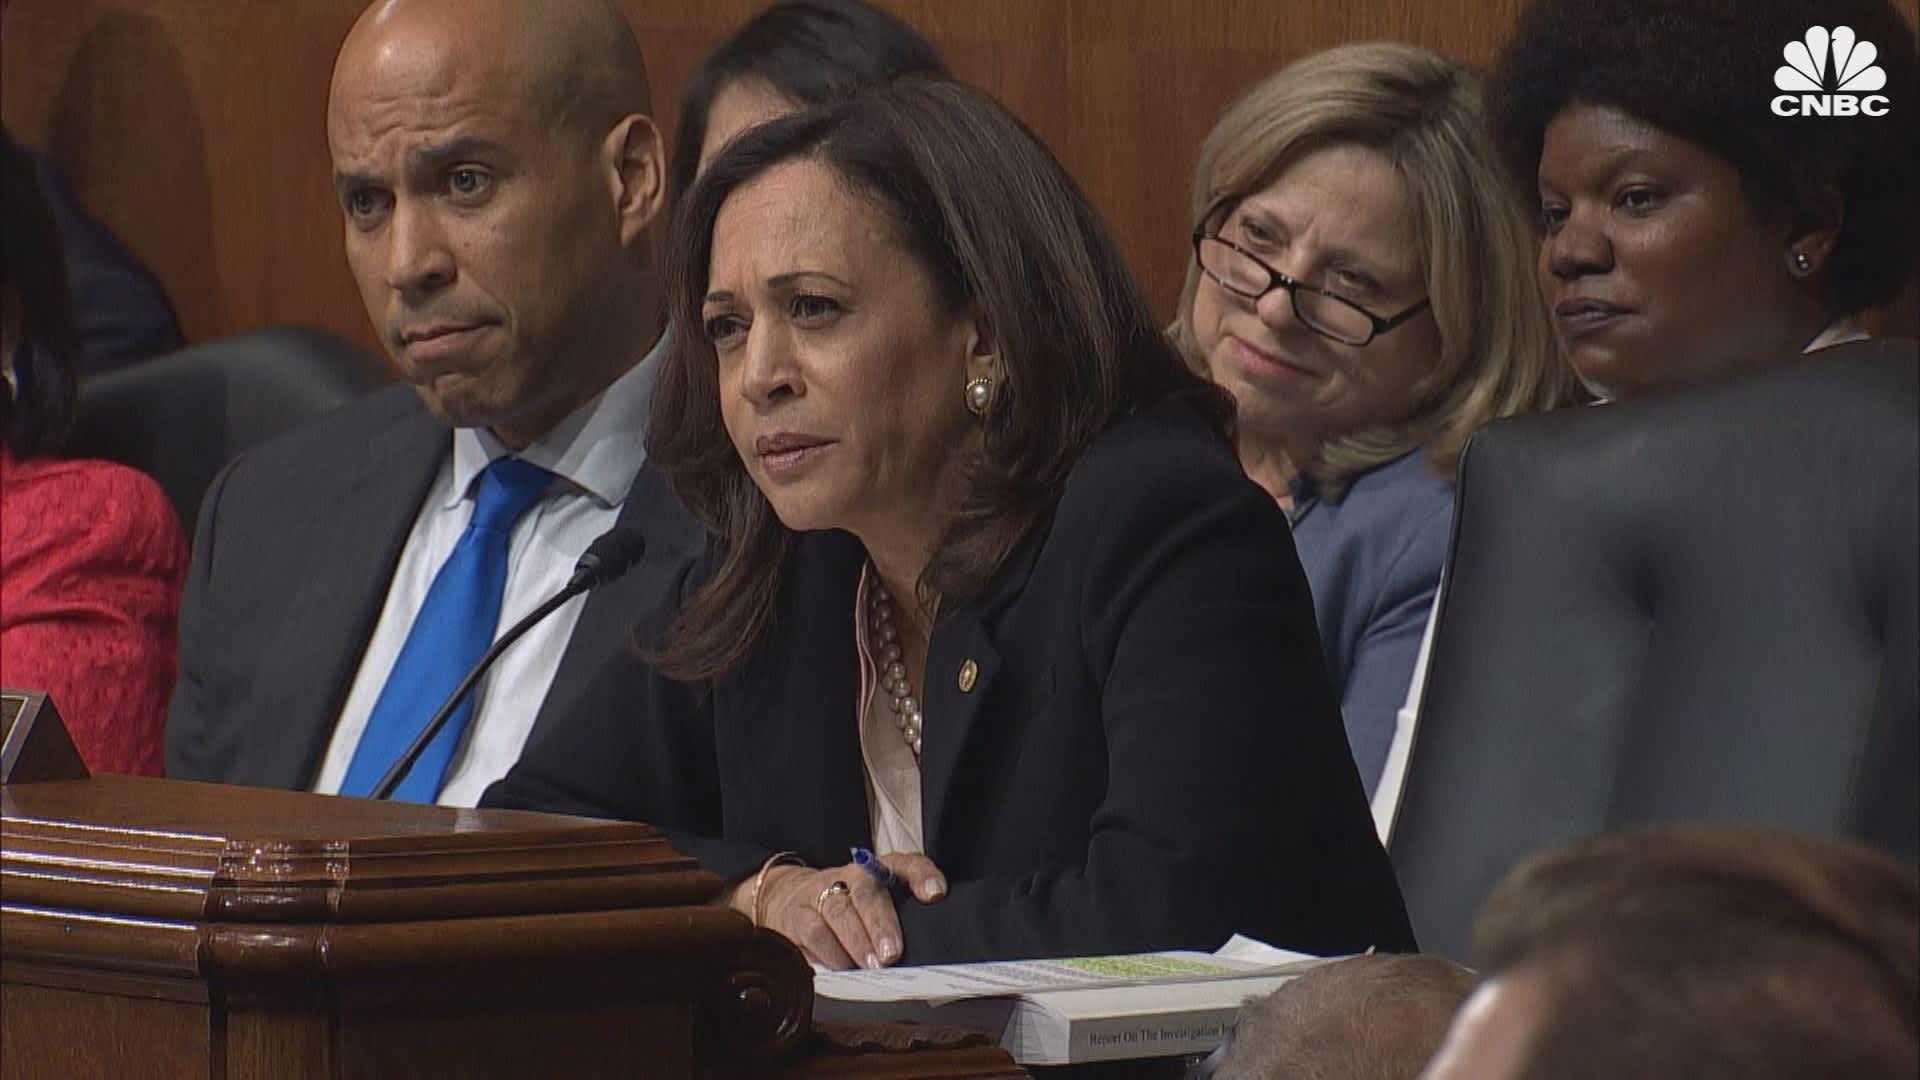 Kamala Harris Grills Ag Barr During Senate Hearing